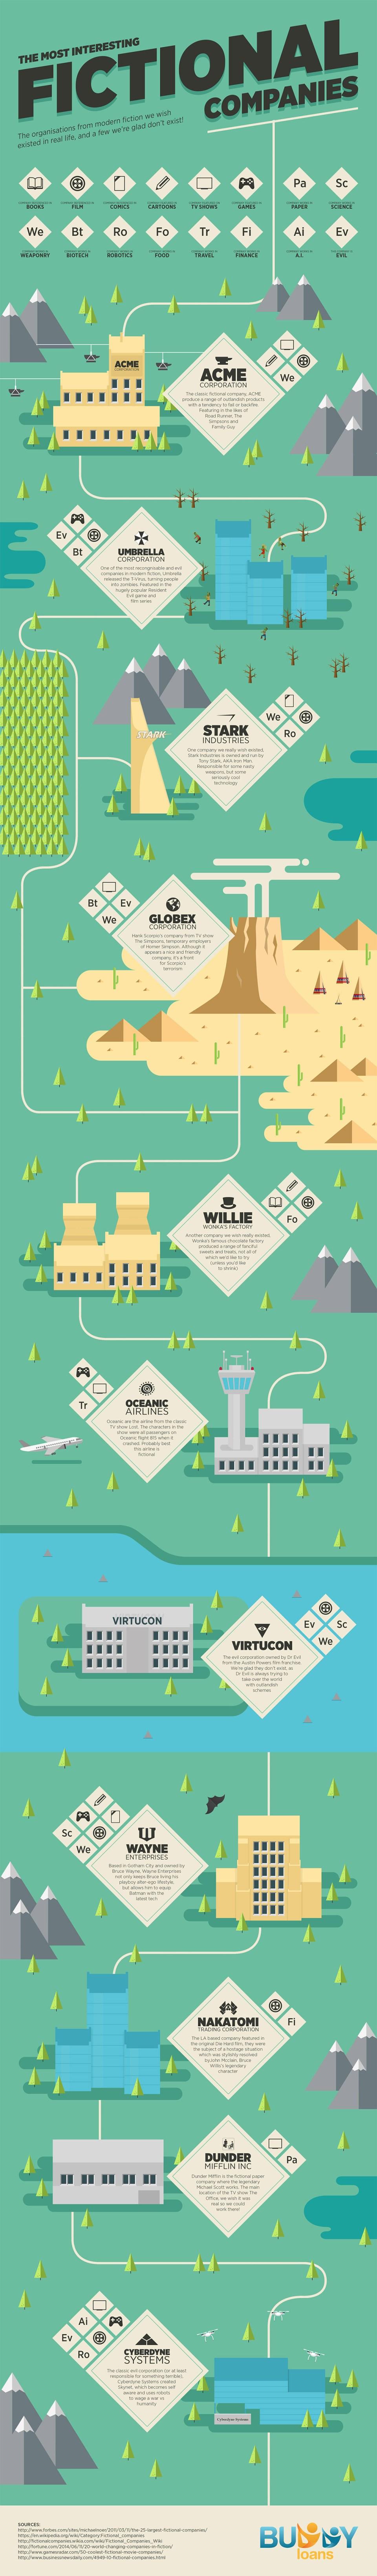 Most Interesting Fictional Companies